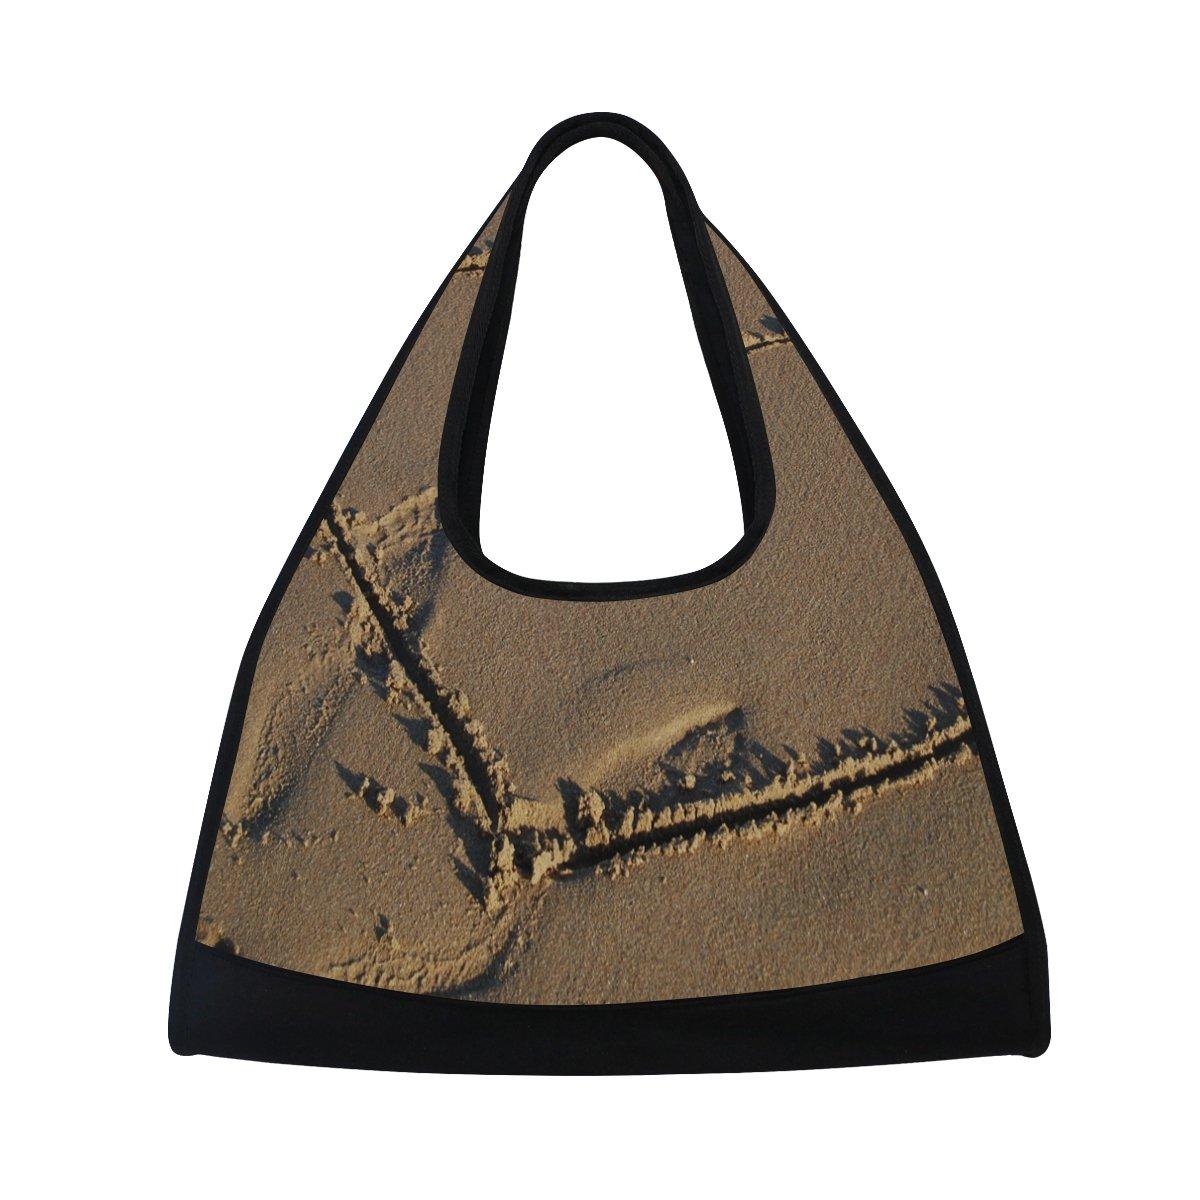 AHOMY Canvas Sports Gym Bag Beach Love Heart Travel Shoulder Bag